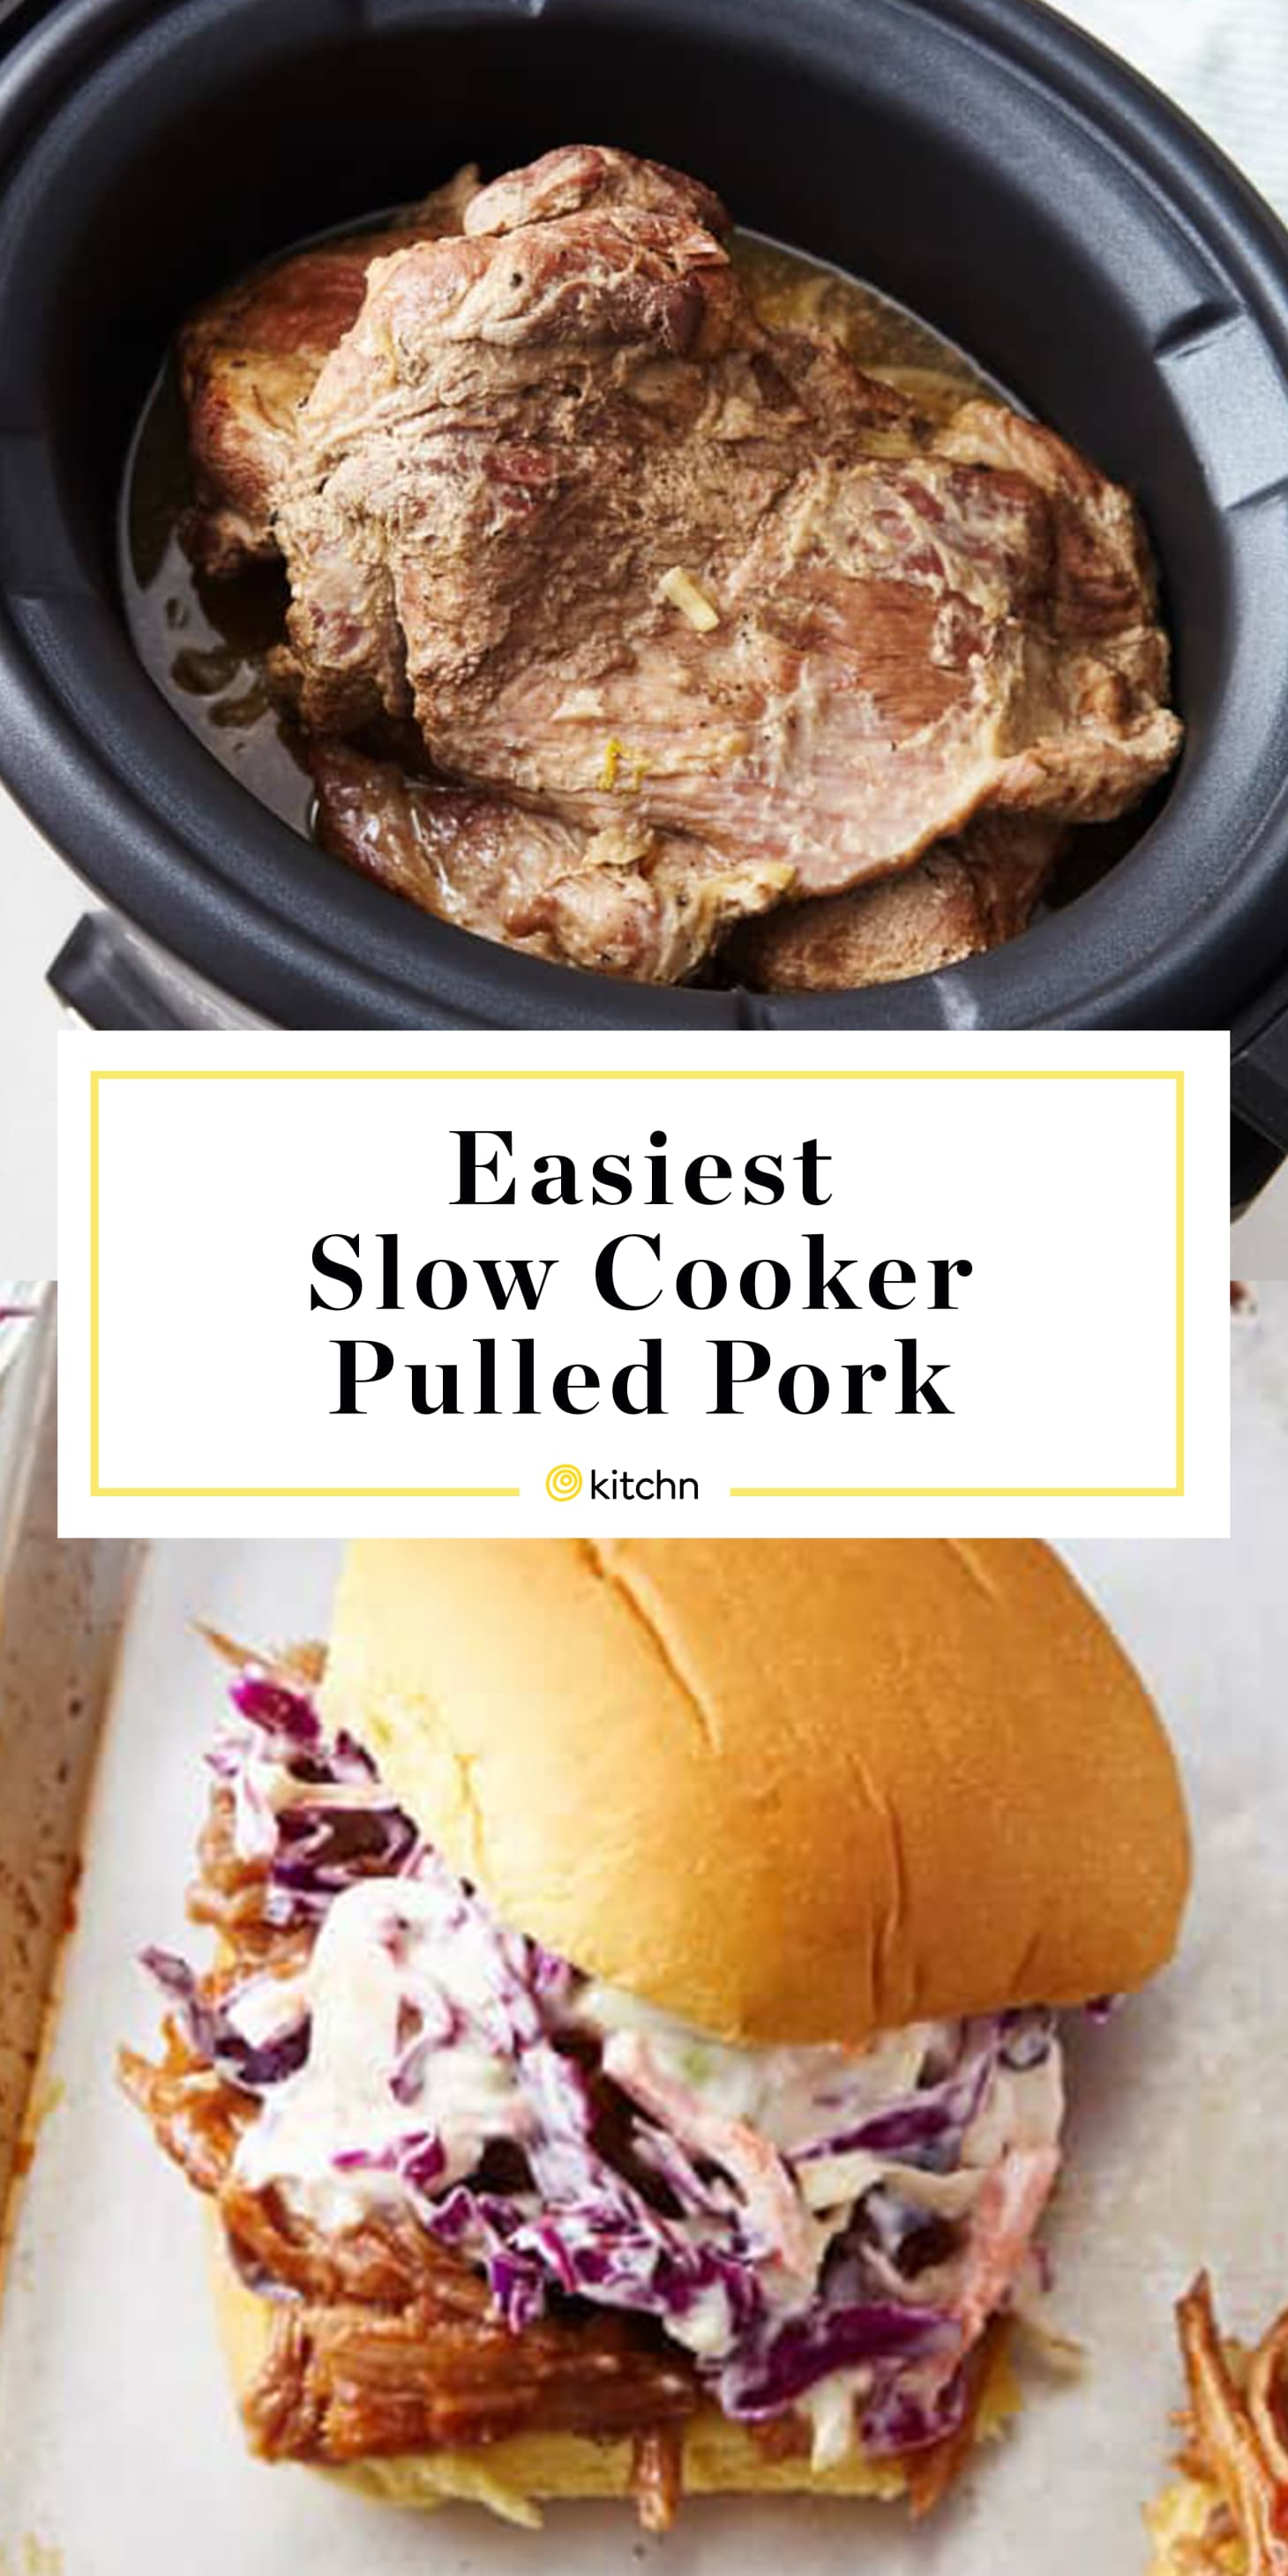 Simple Slow Cooker Pulled Pork